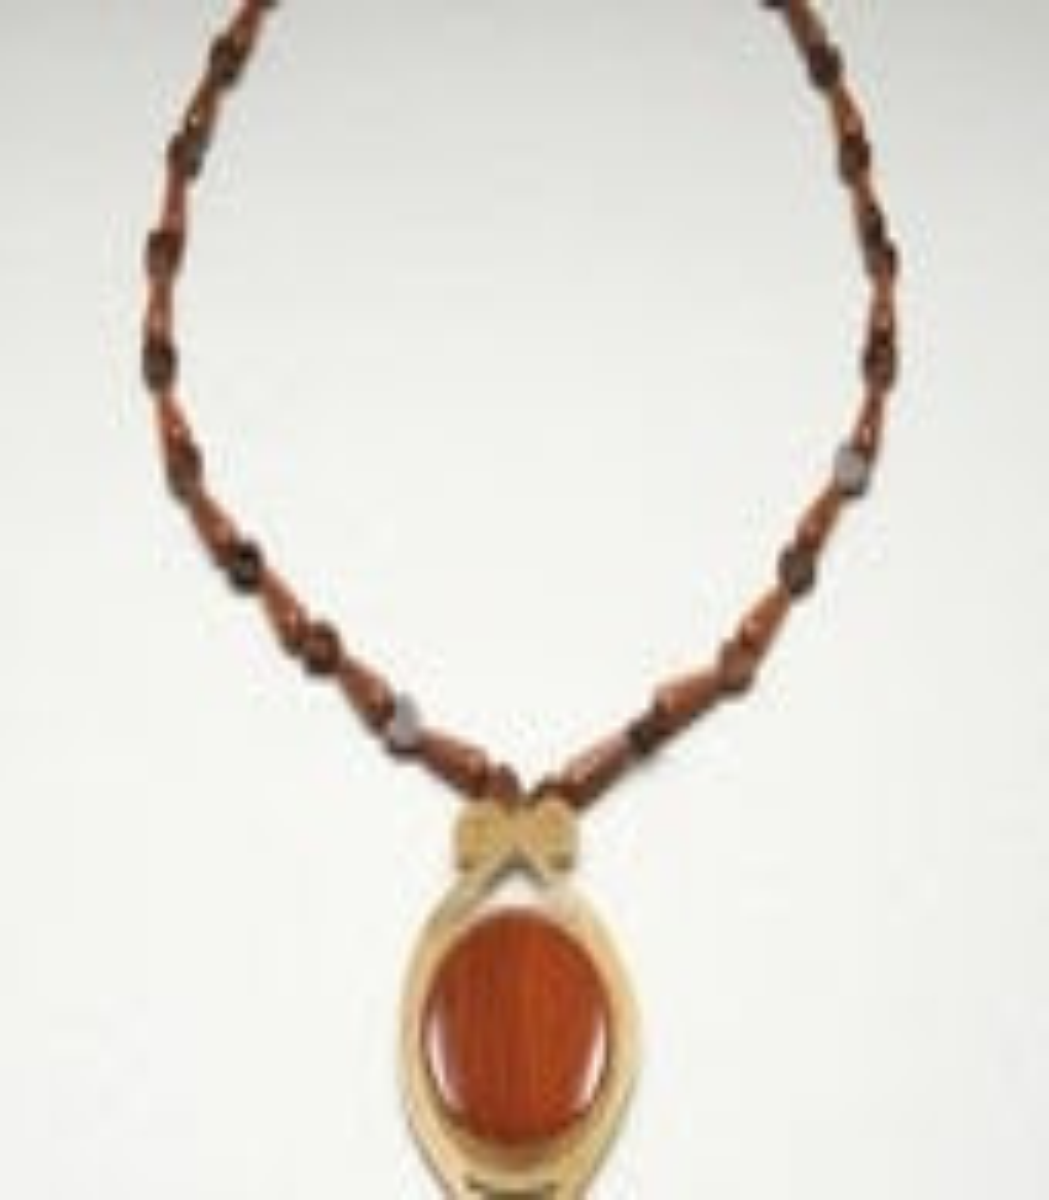 14k Gold-filled Red Jasper Pendant Pin Necklace